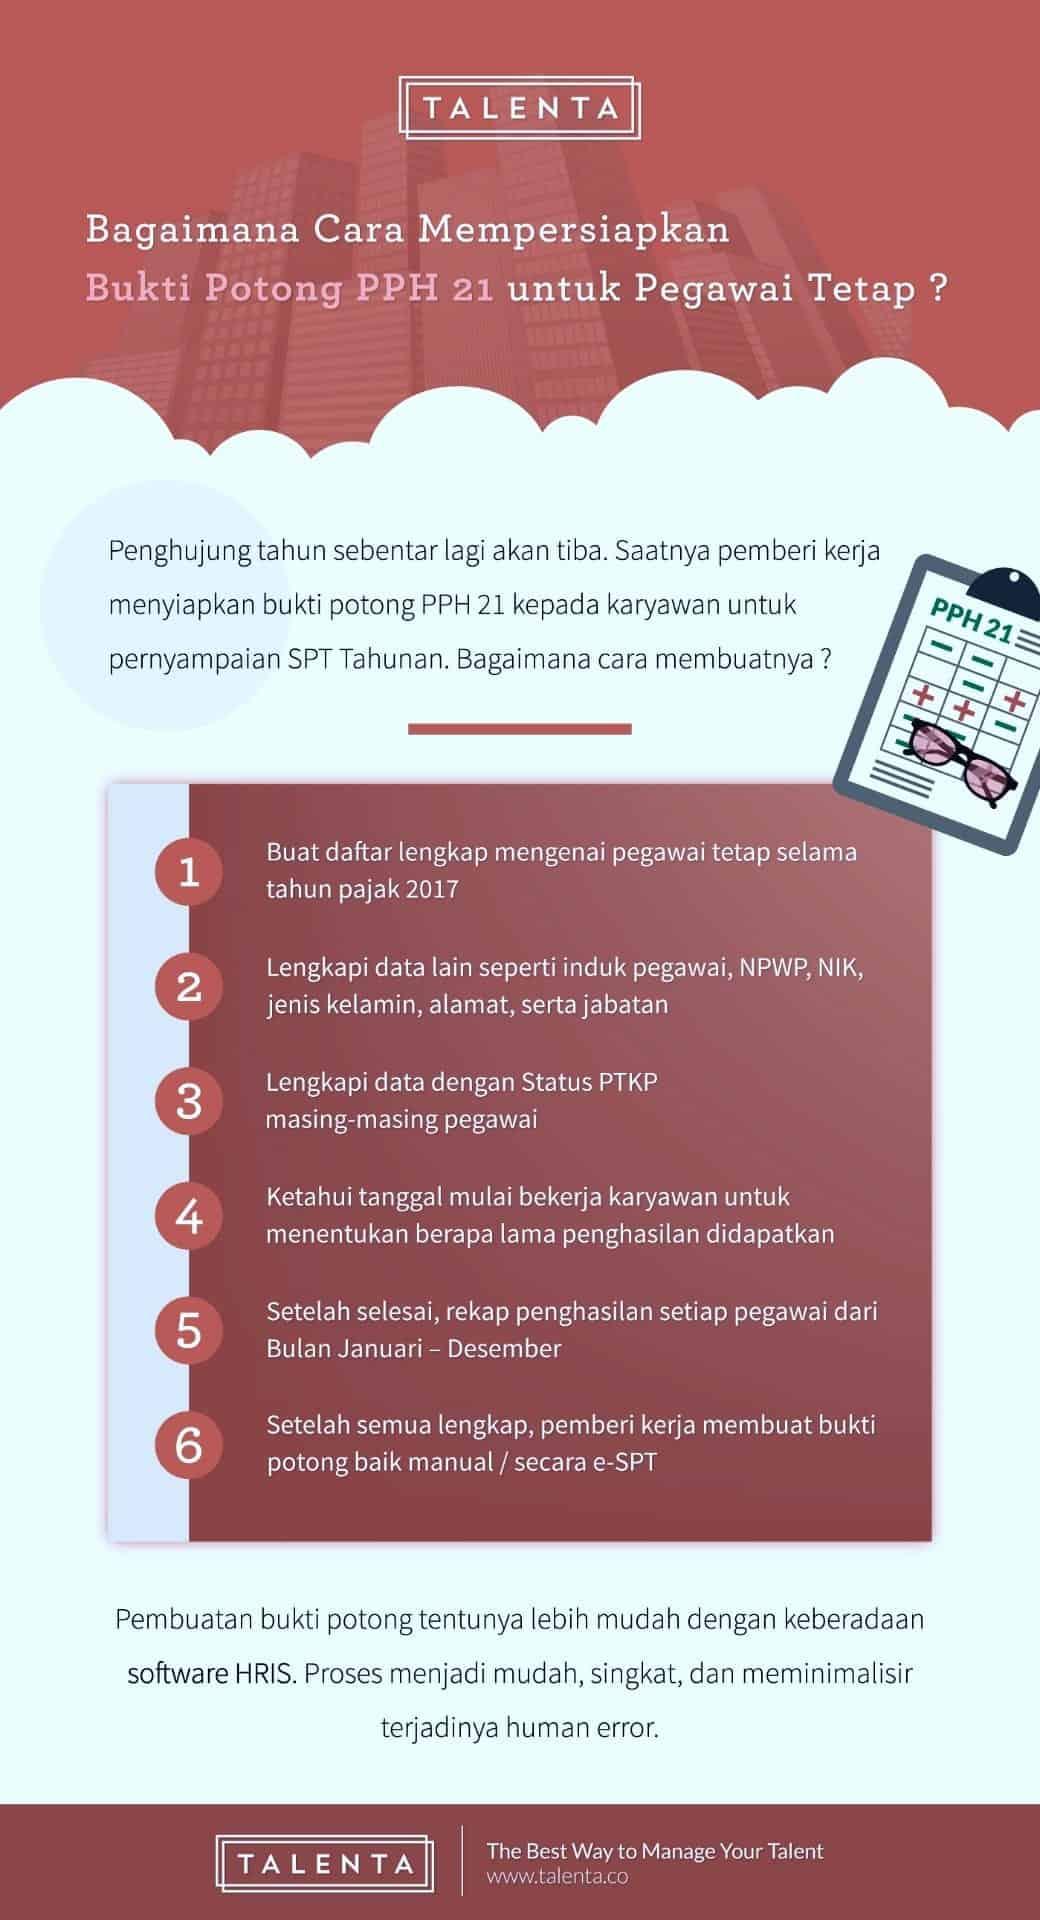 Infographic-pph21-bukti-potong-01-1 (2)